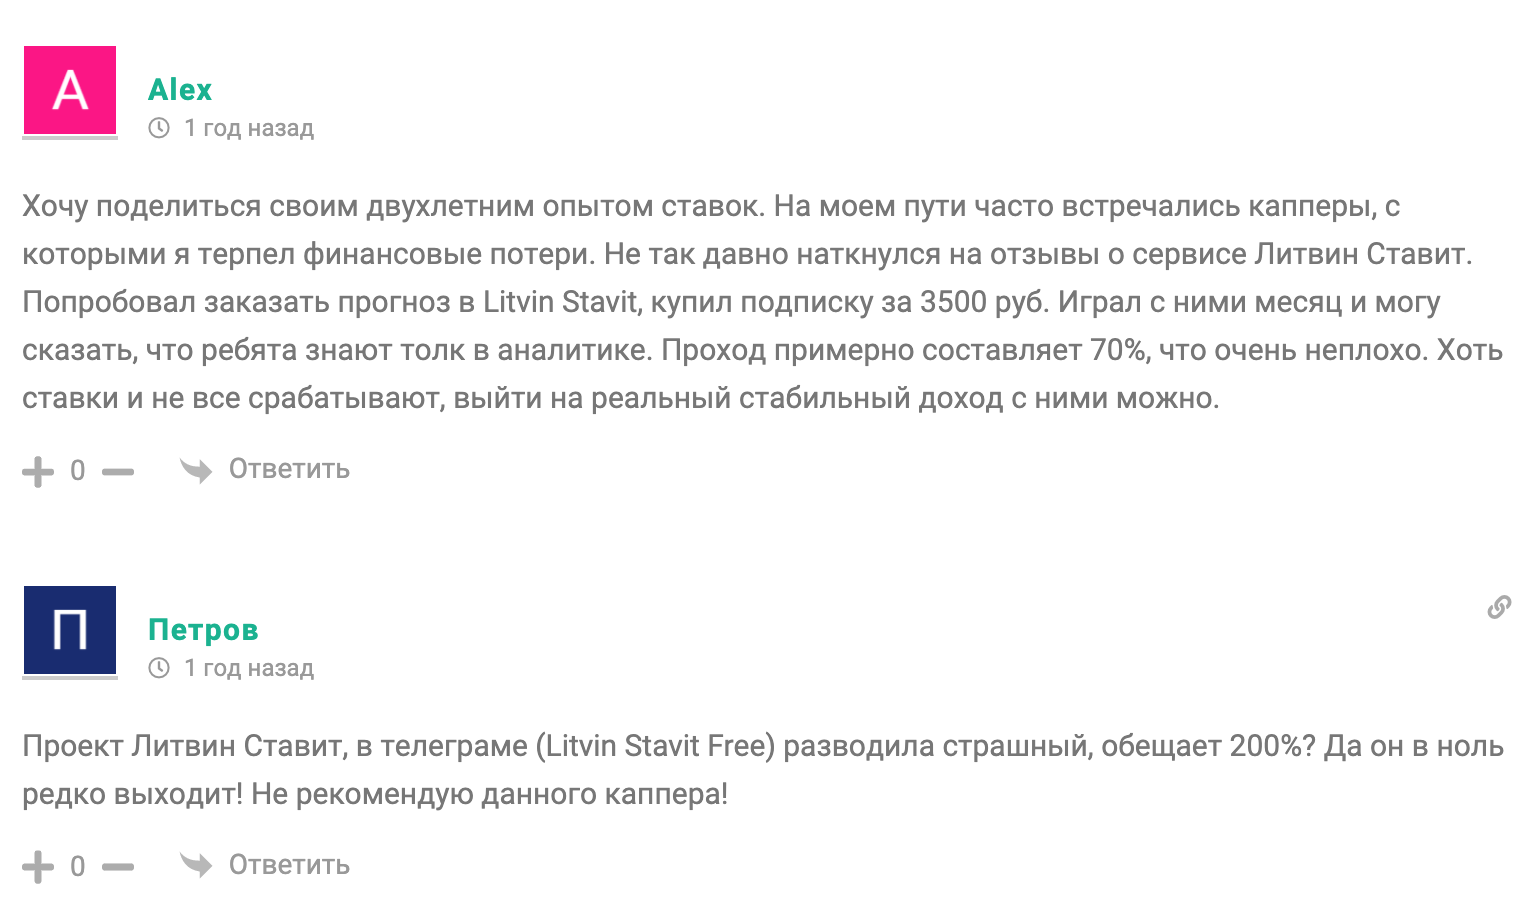 Отзывы Litvin Stavit Free (Литвин Ставит)